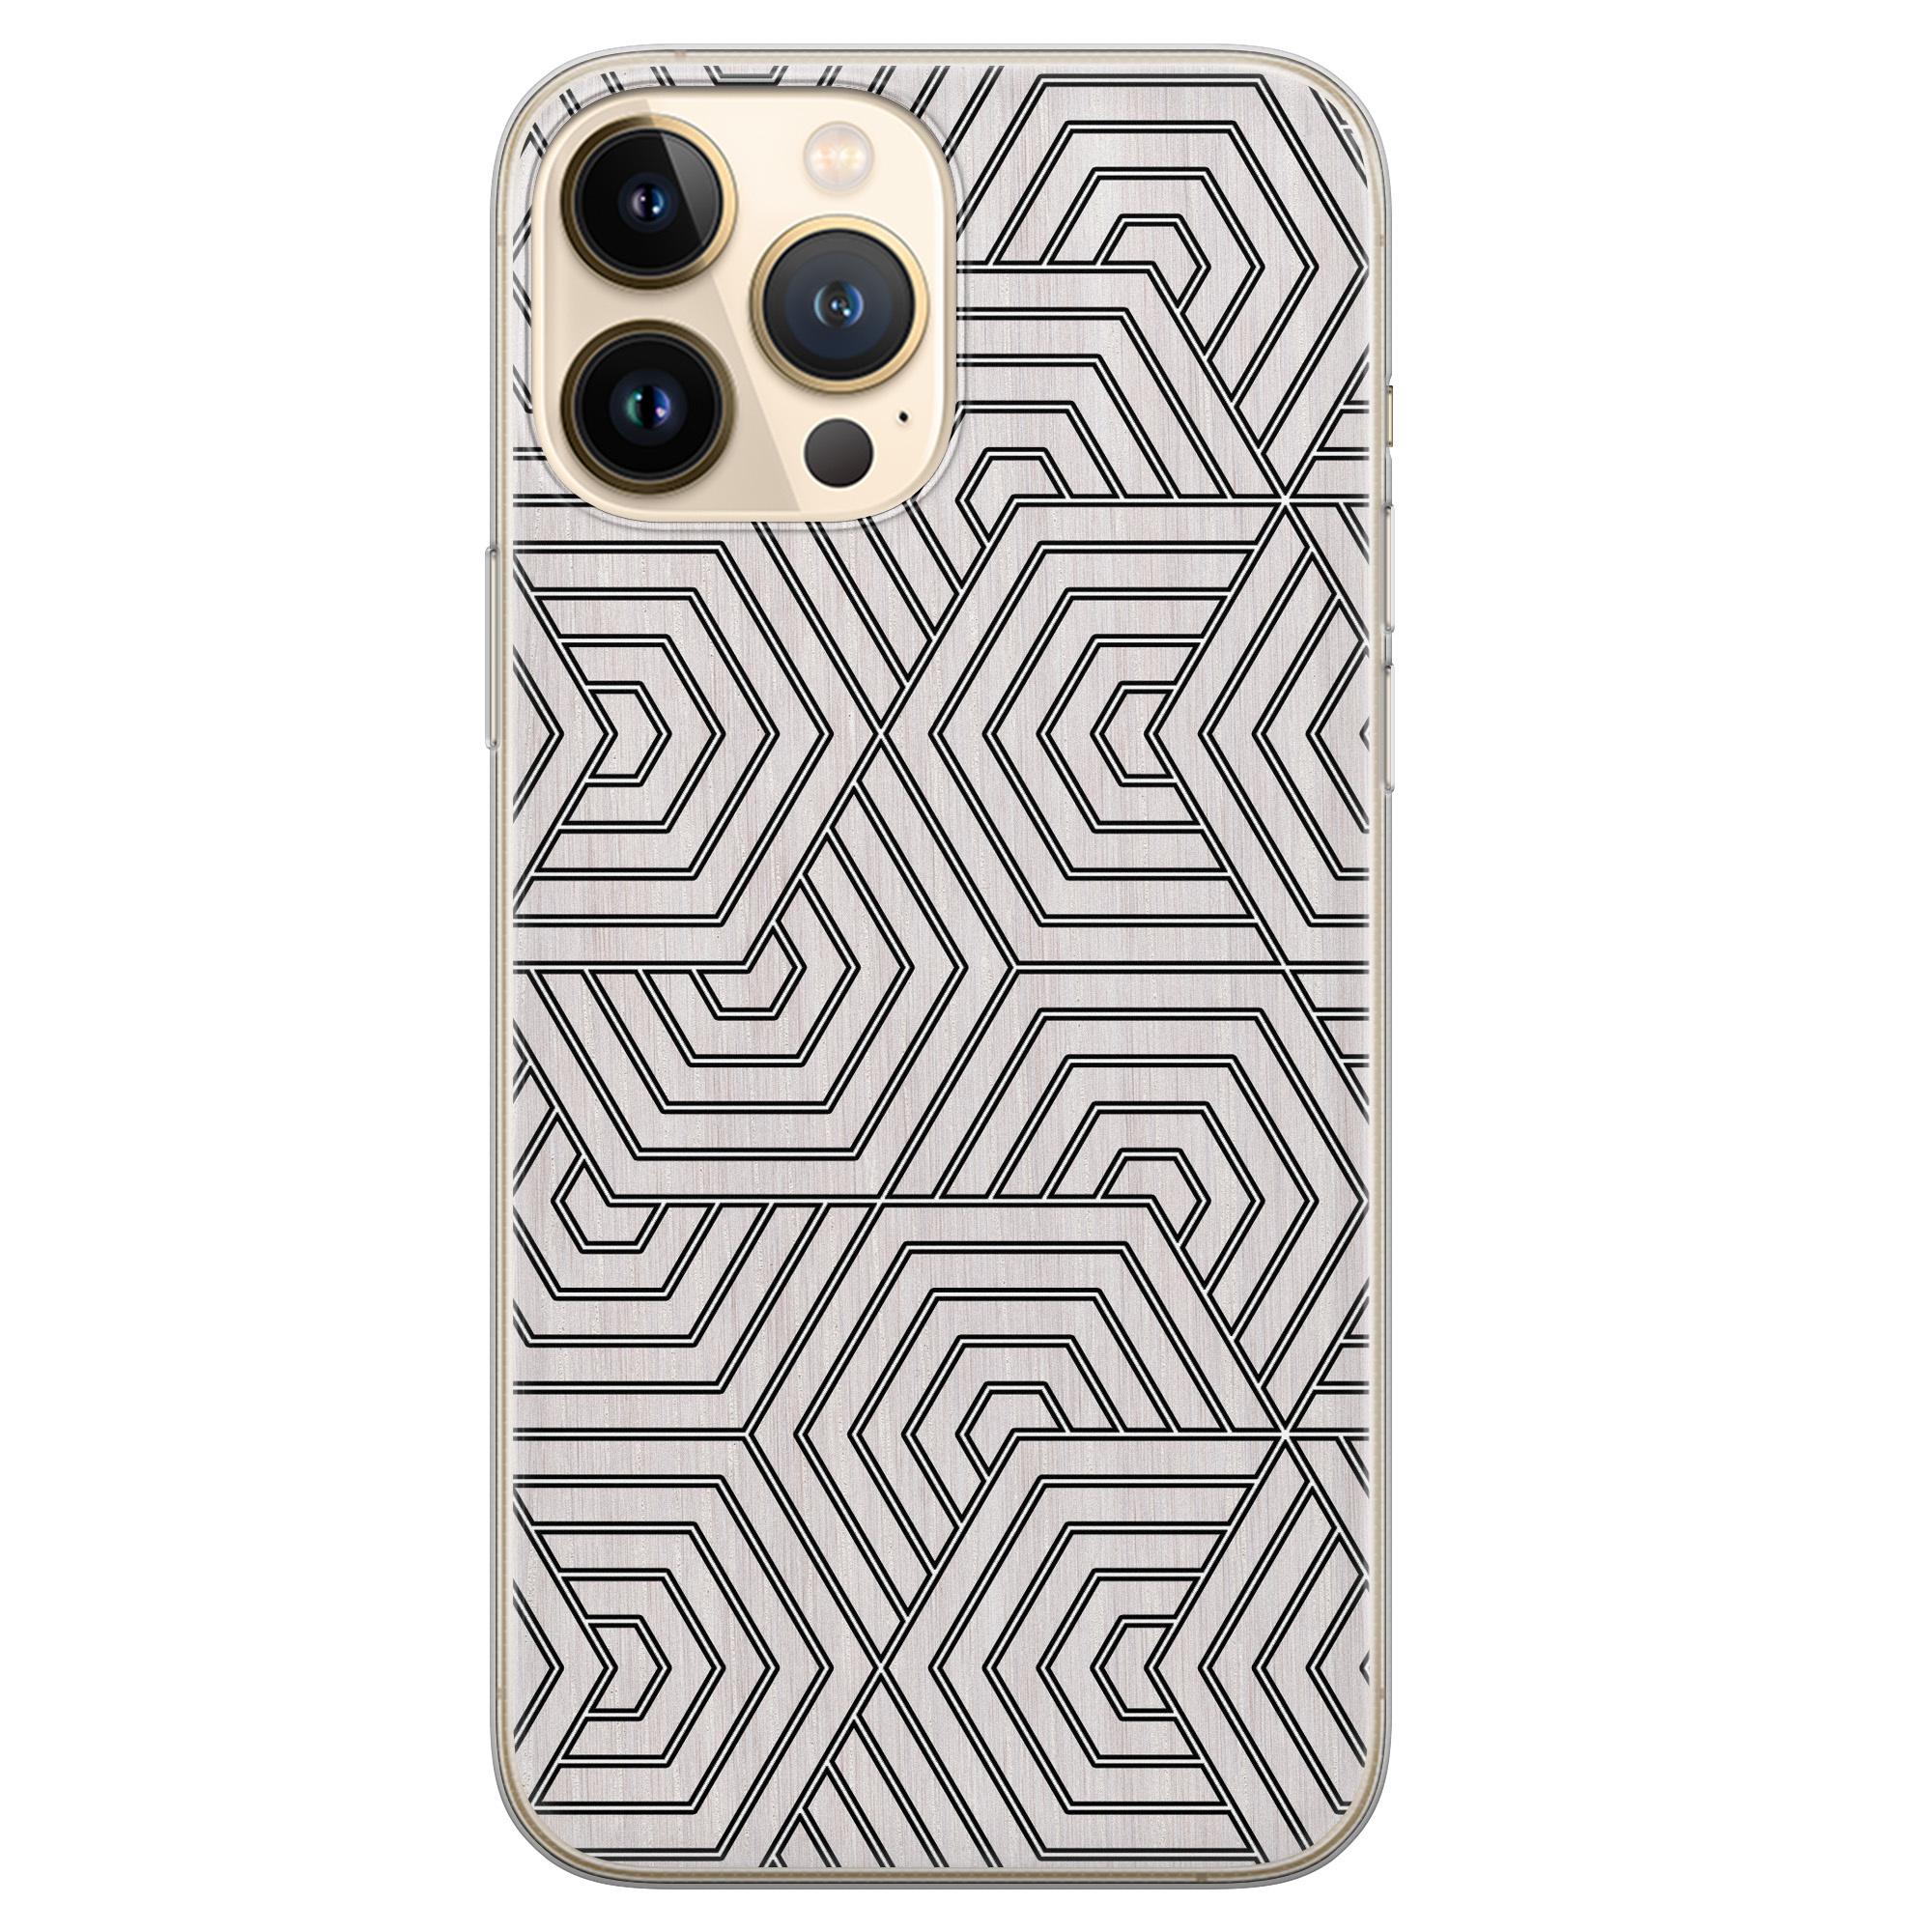 Leuke Telefoonhoesjes iPhone 13 Pro Max siliconen hoesje - Geometrisch